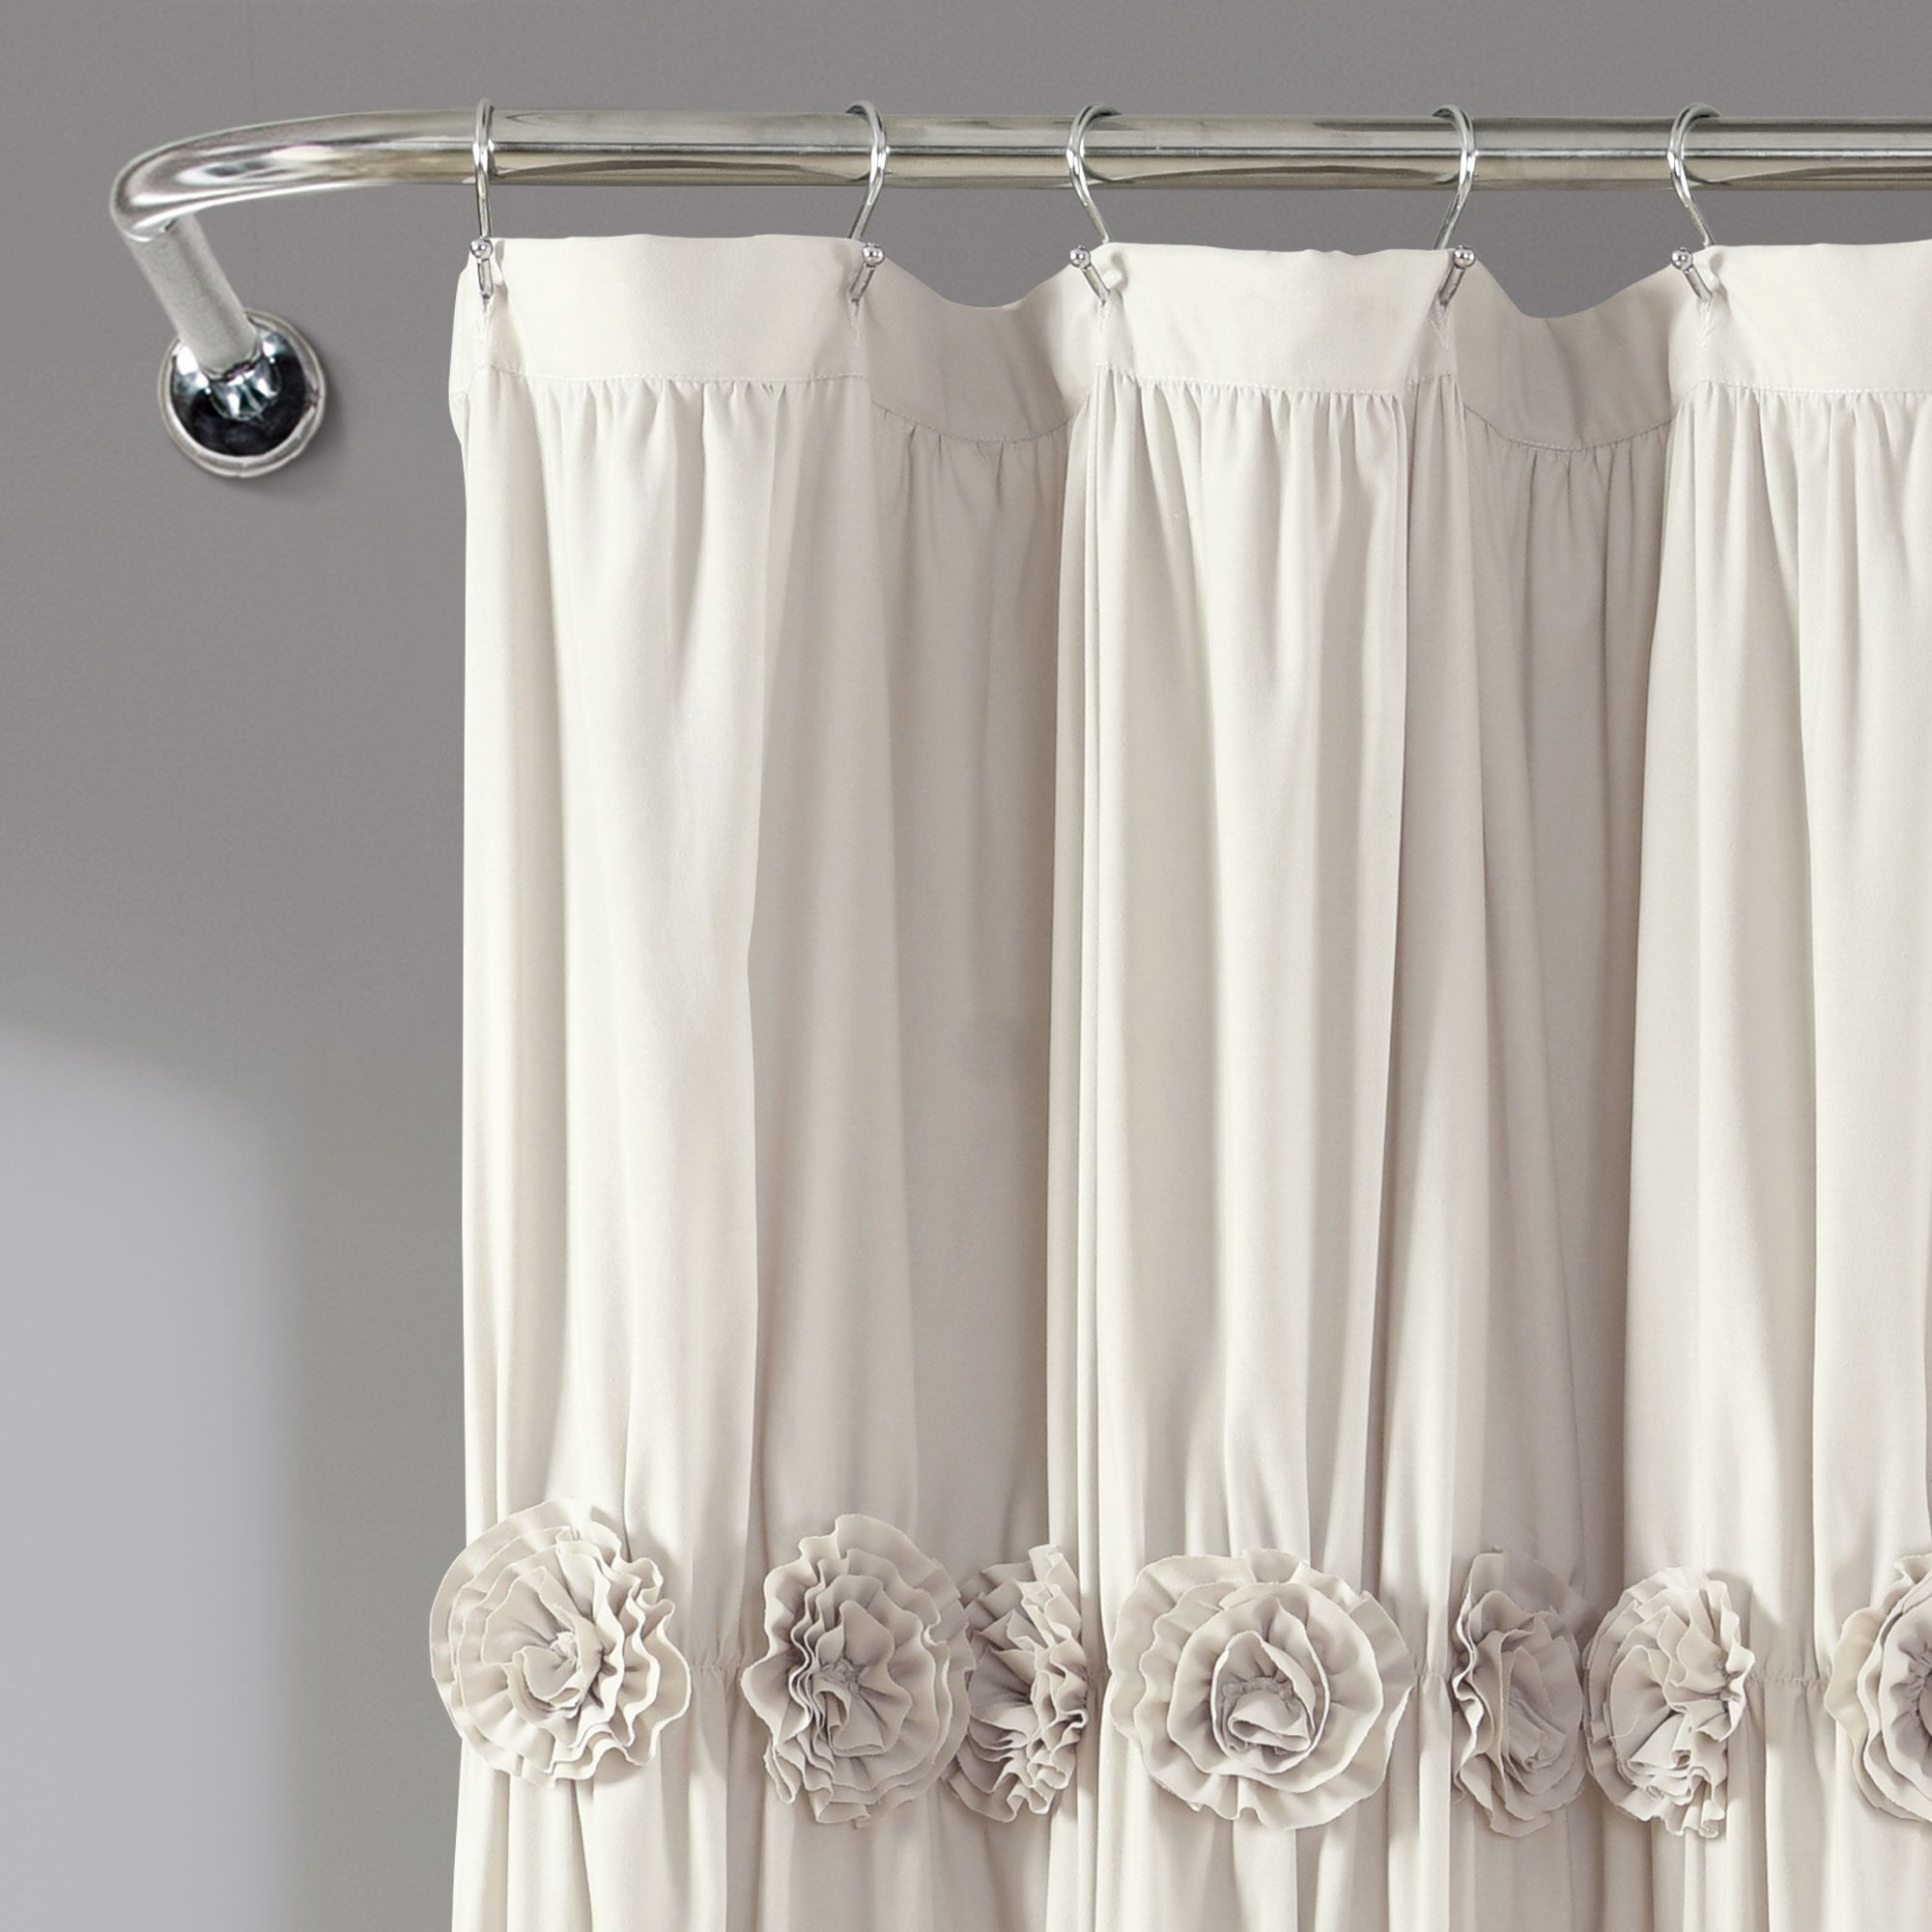 Darla 72 X 72 Shower Curtain Walmart Com In 2020 Pretty Shower Curtains Shabby Chic Shower Curtain Shower Curtain